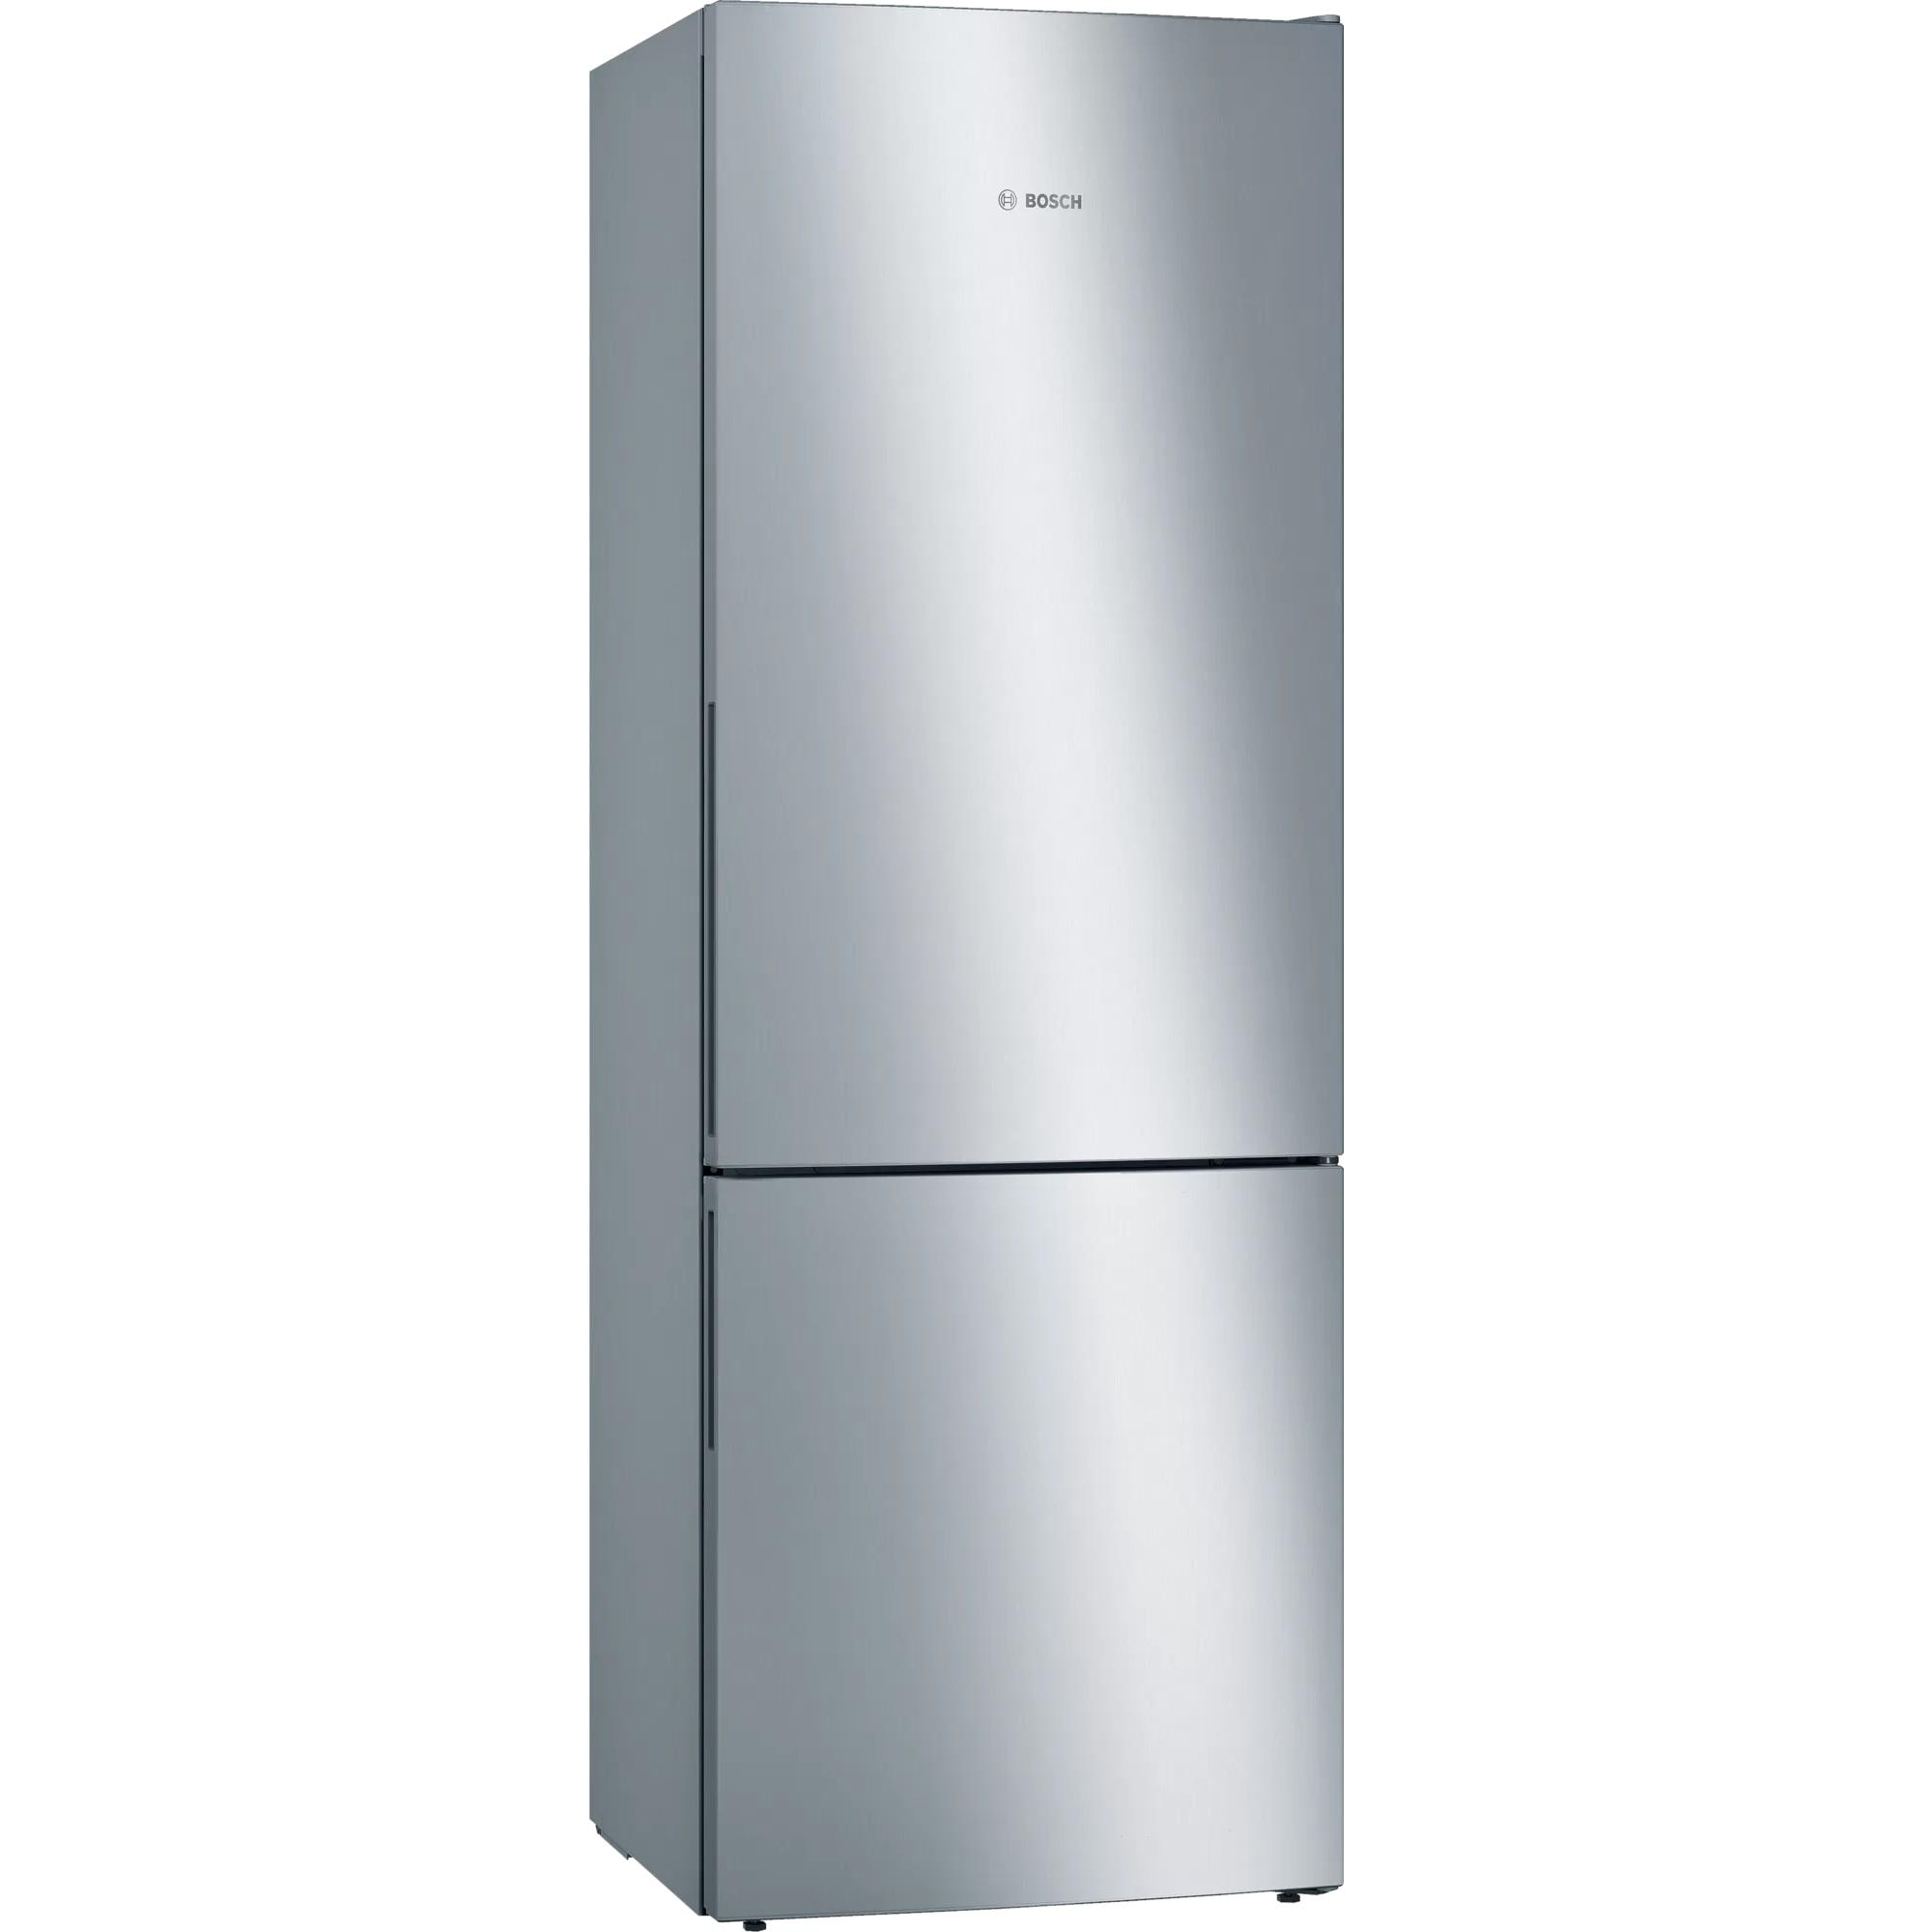 Fotografie Combina frigorifica Bosch KGE49AICA, 419 l, Clasa C, Low Frost, VitaFresh, H 201 cm, Inox antiamprenta